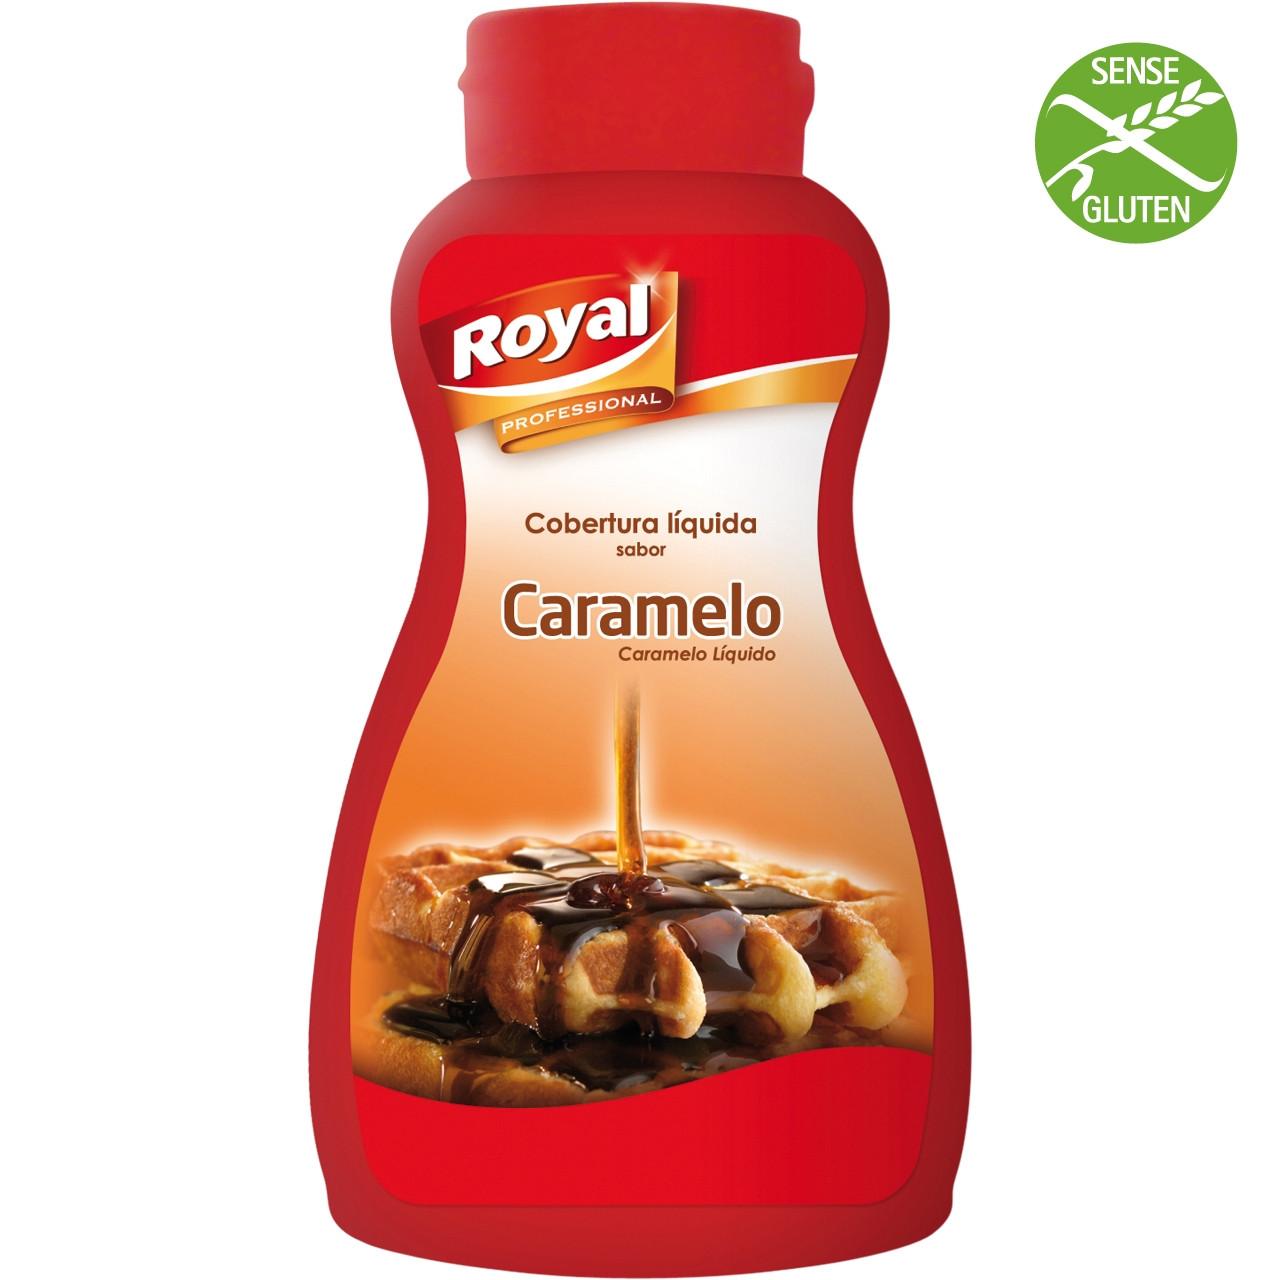 Caramel líquid Royal 1 kg.